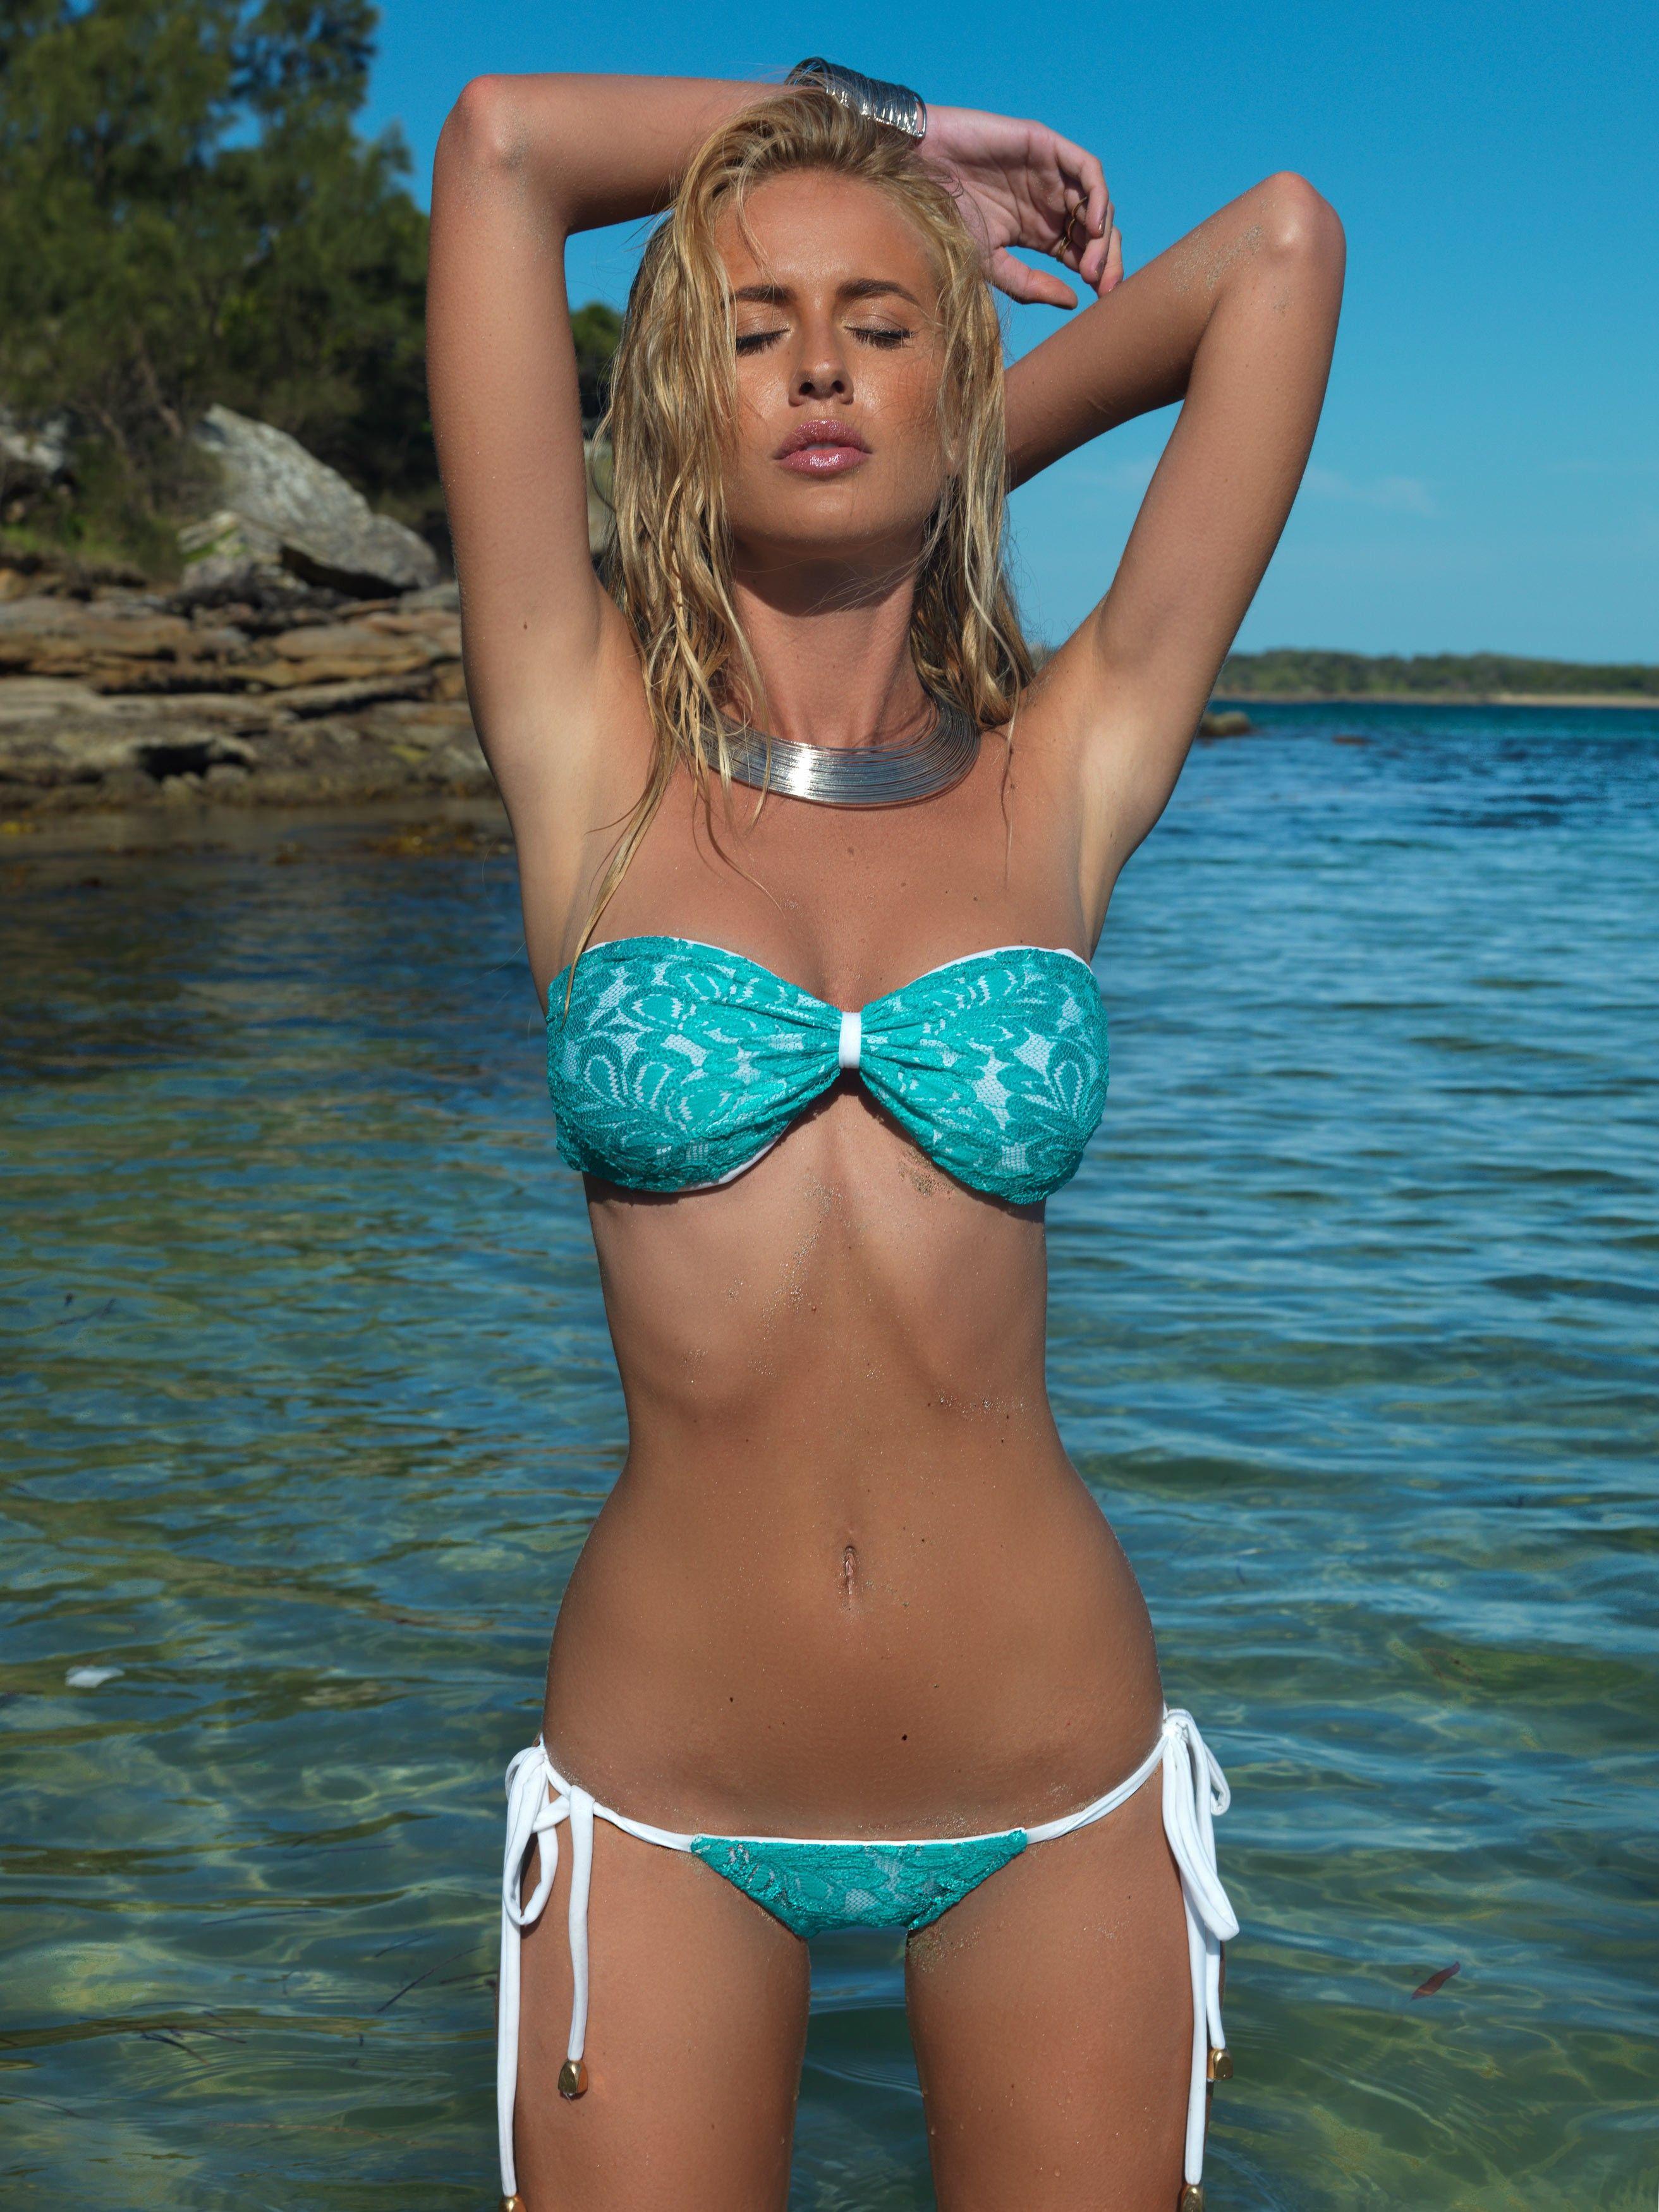 Bikini Renee Somerfield nude photos 2019